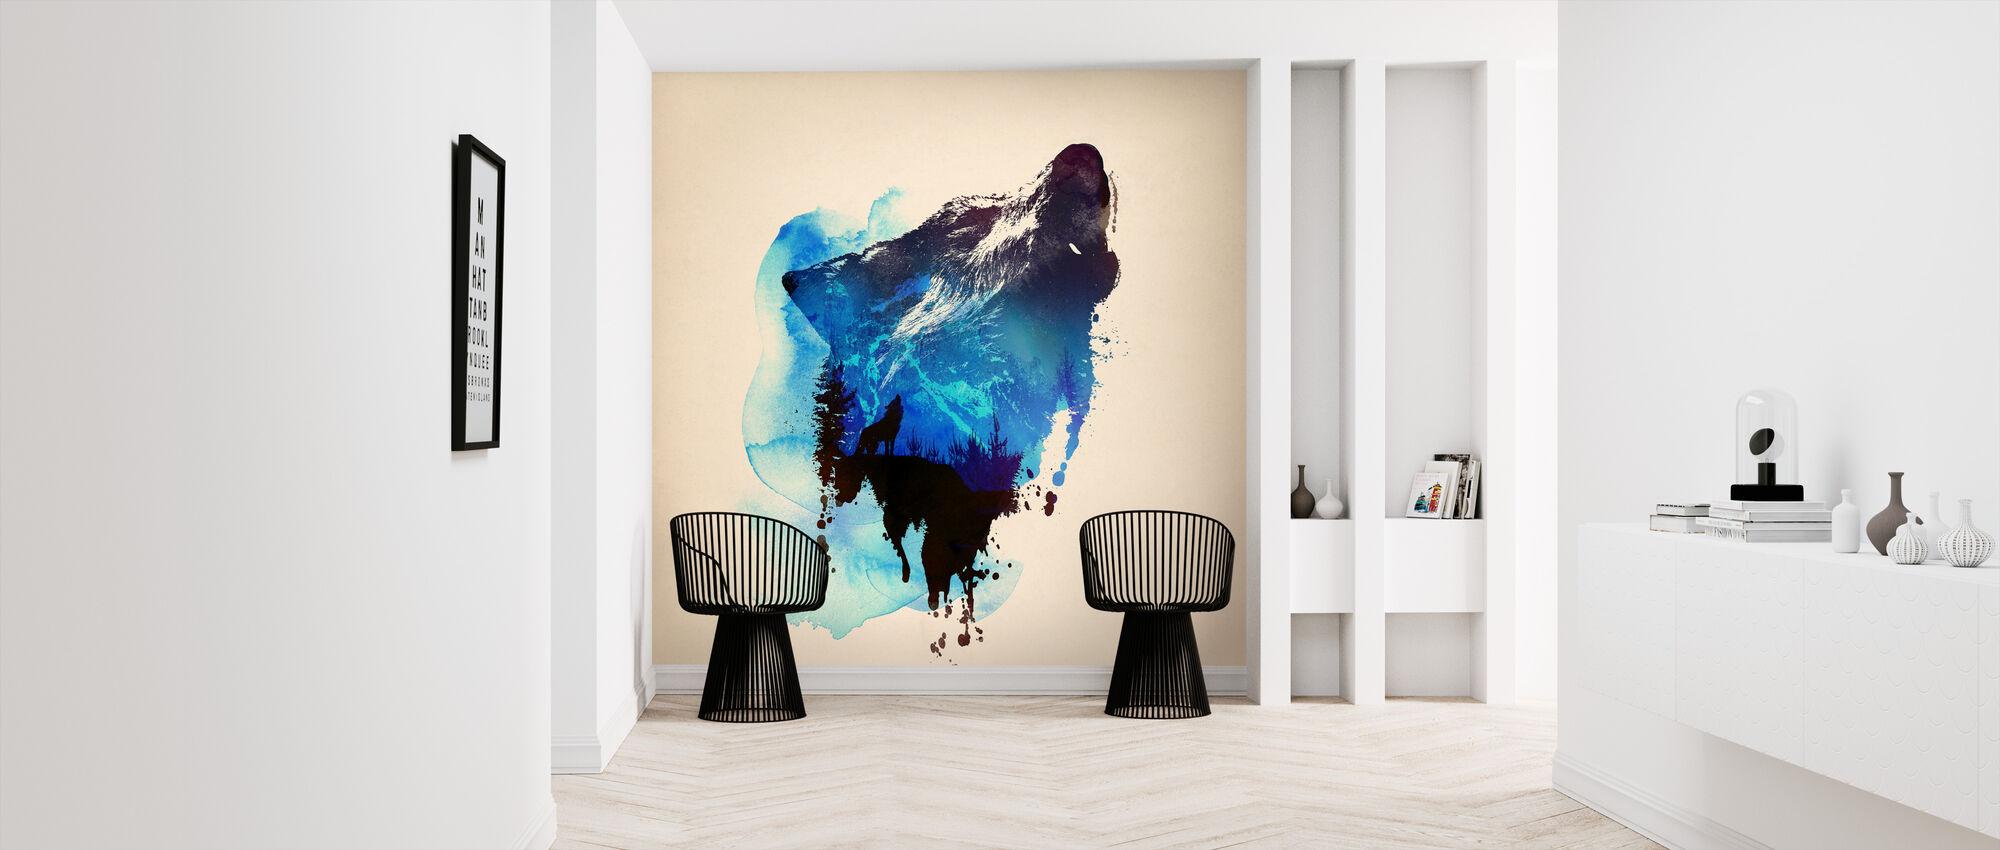 Alone as a Wolf - Wallpaper - Hallway